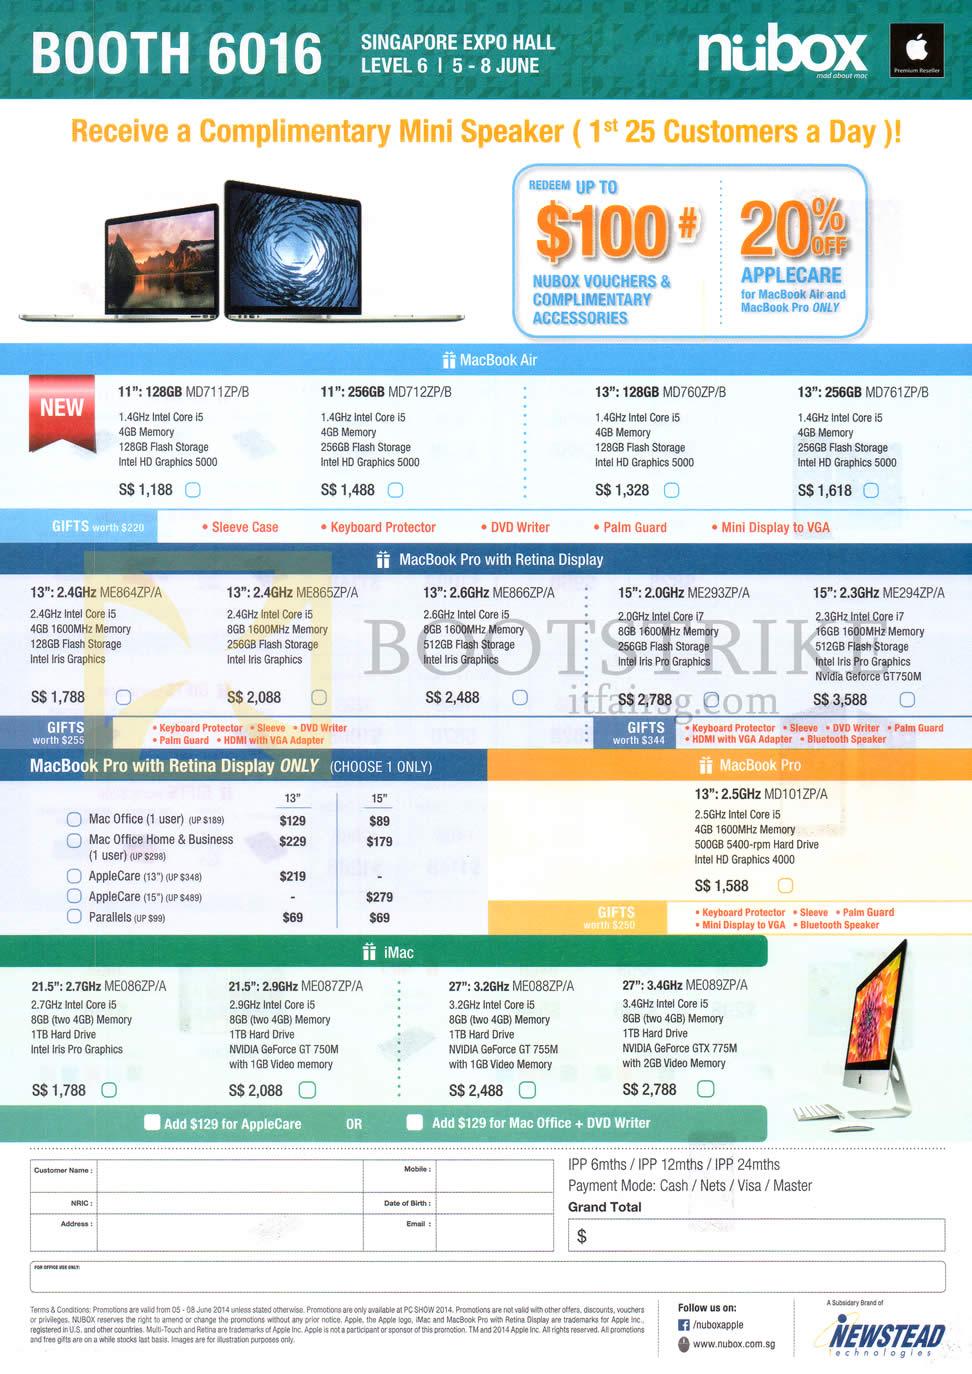 PC SHOW 2014 price list image brochure of Nubox Apple MacBook Air Notebook, MacBook Pro, IMac Desktop PC